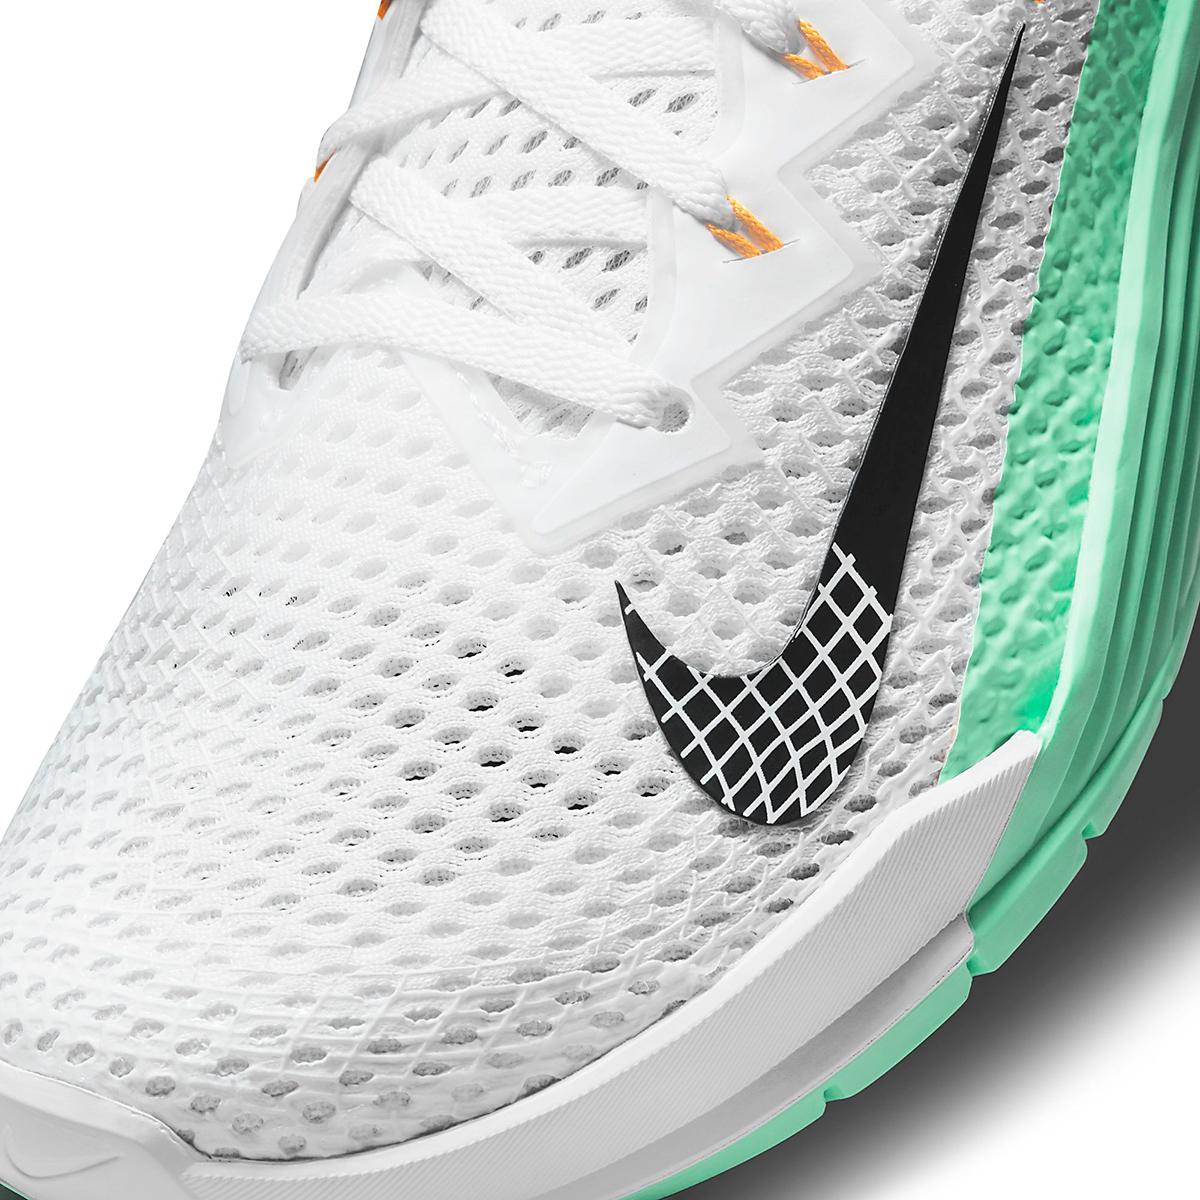 Women's Nike Metcon 6 Training Shoe - Color: White/Smoke Grey/Infinite Lilac - Size: 5 - Width: Regular, White/Smoke Grey/Infinite Lilac, large, image 7